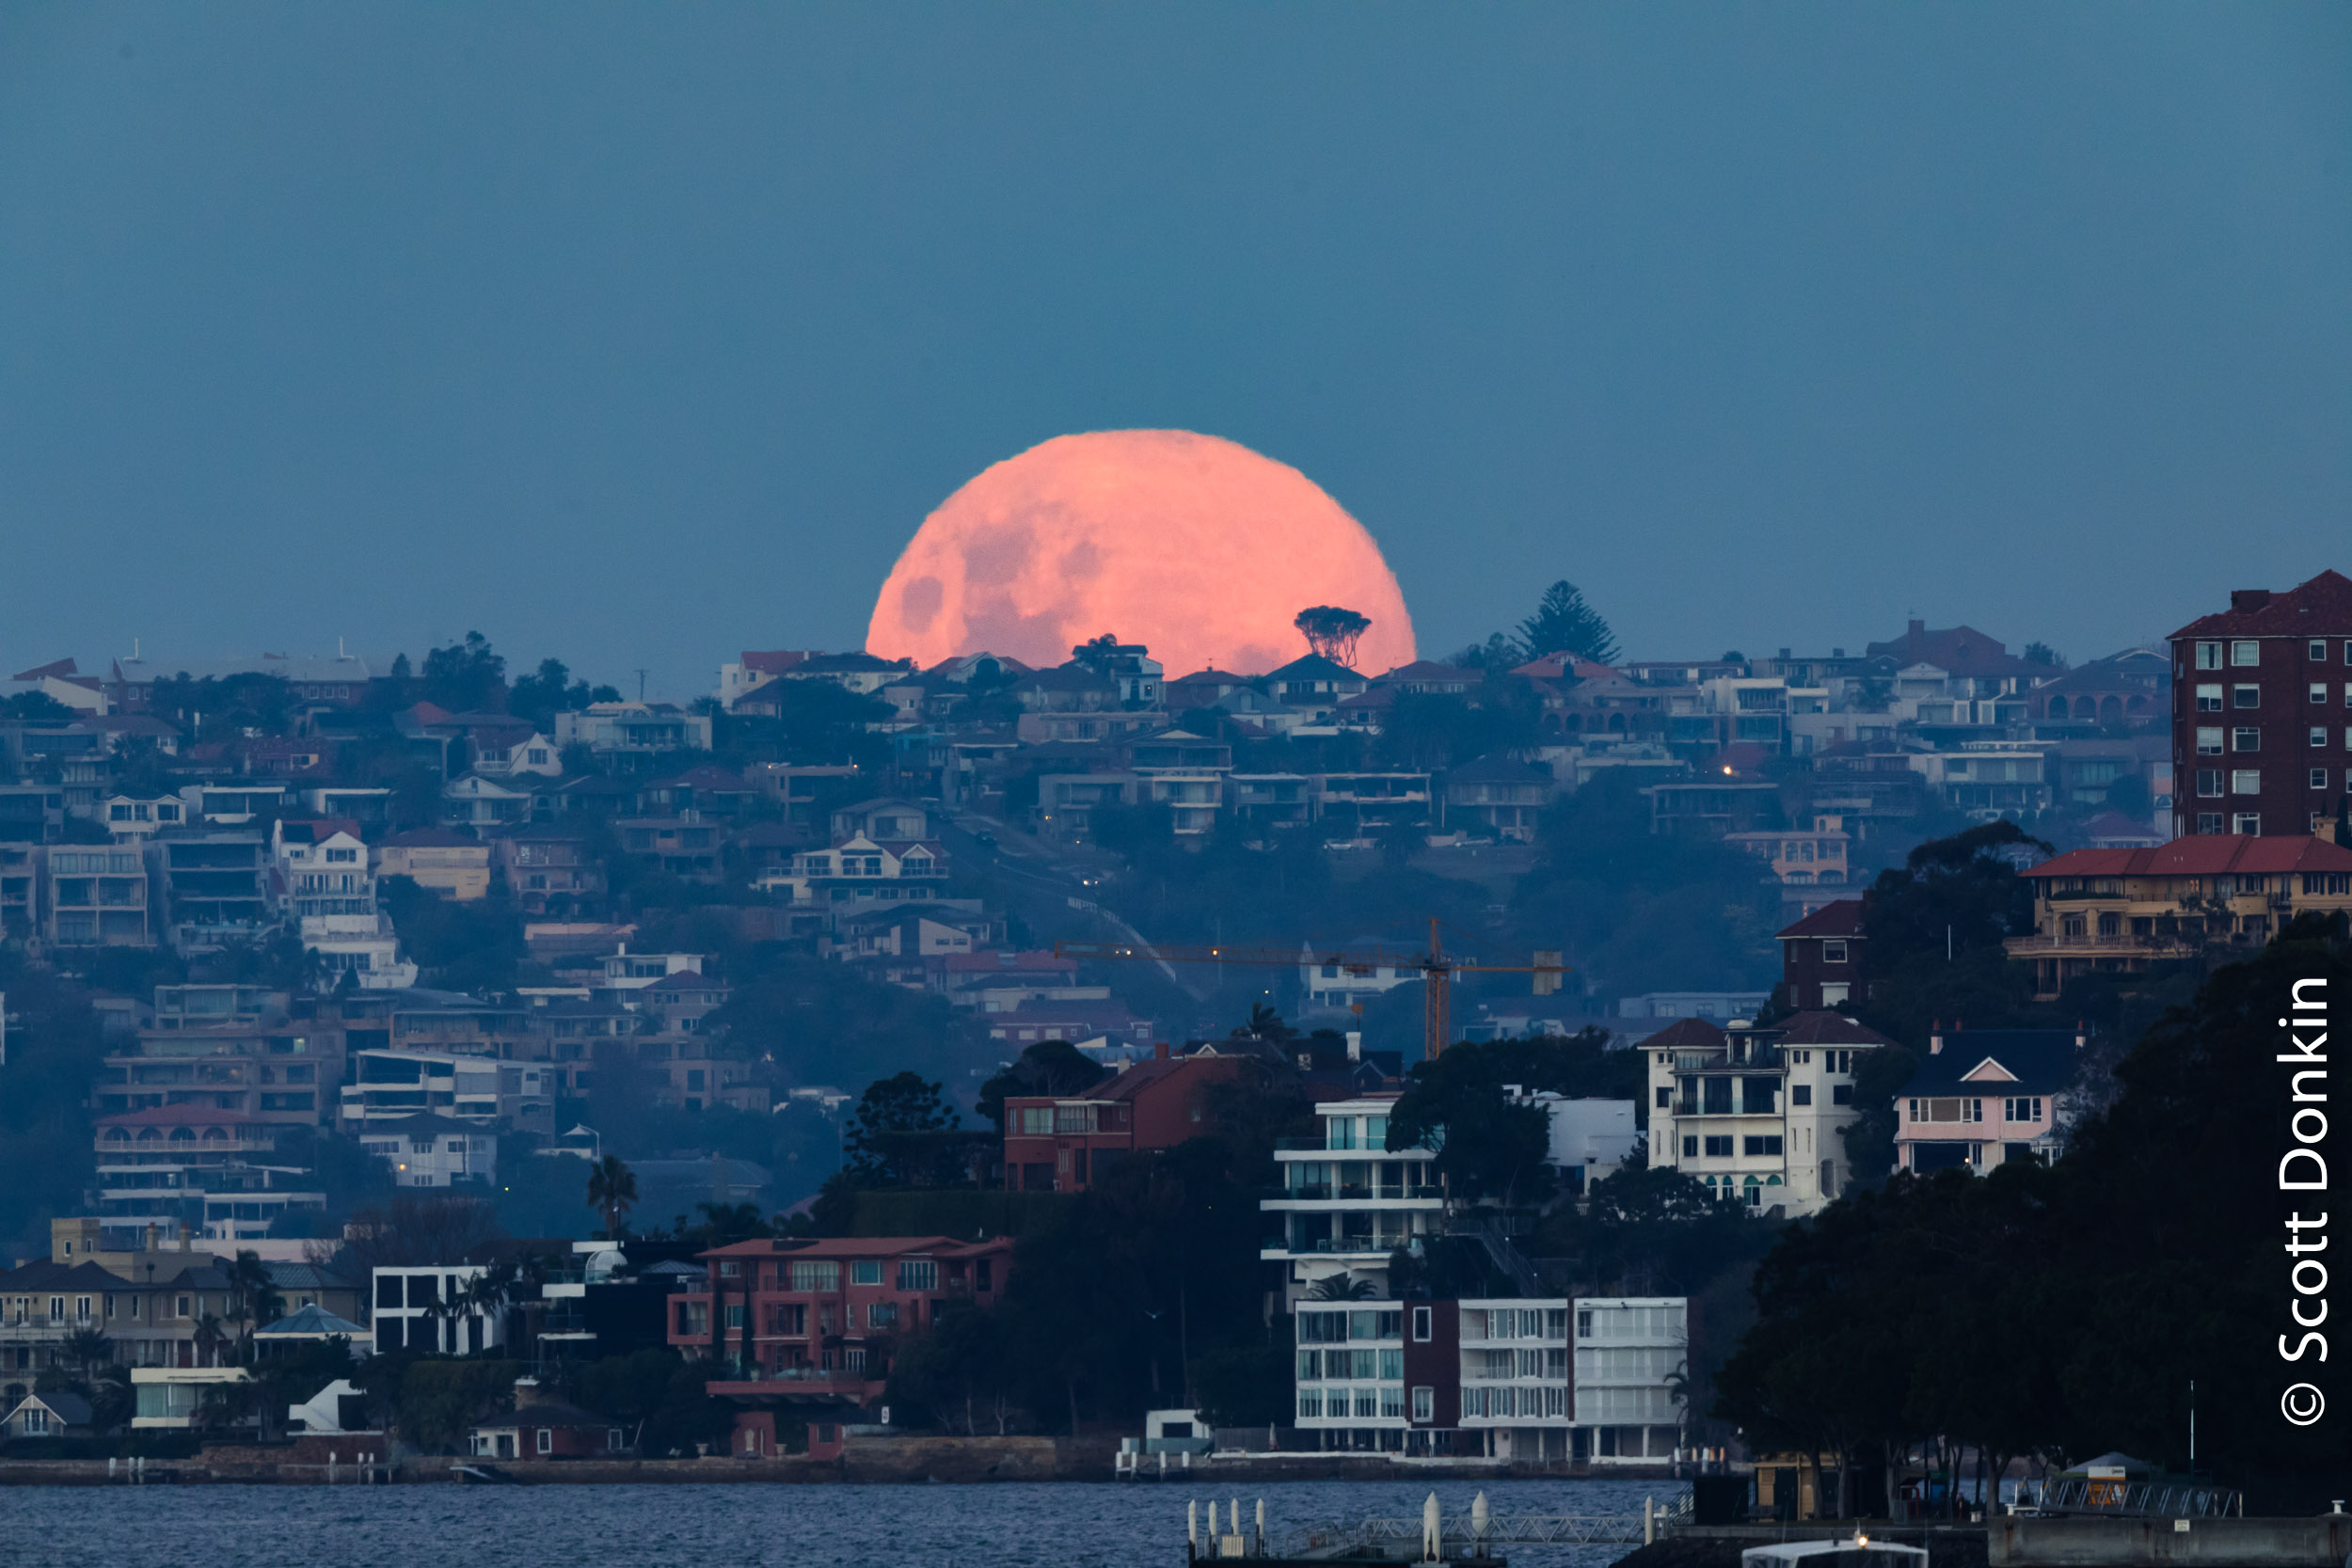 Moonrise over Vaucluse, Sydney at dusk. 29 May 2018.